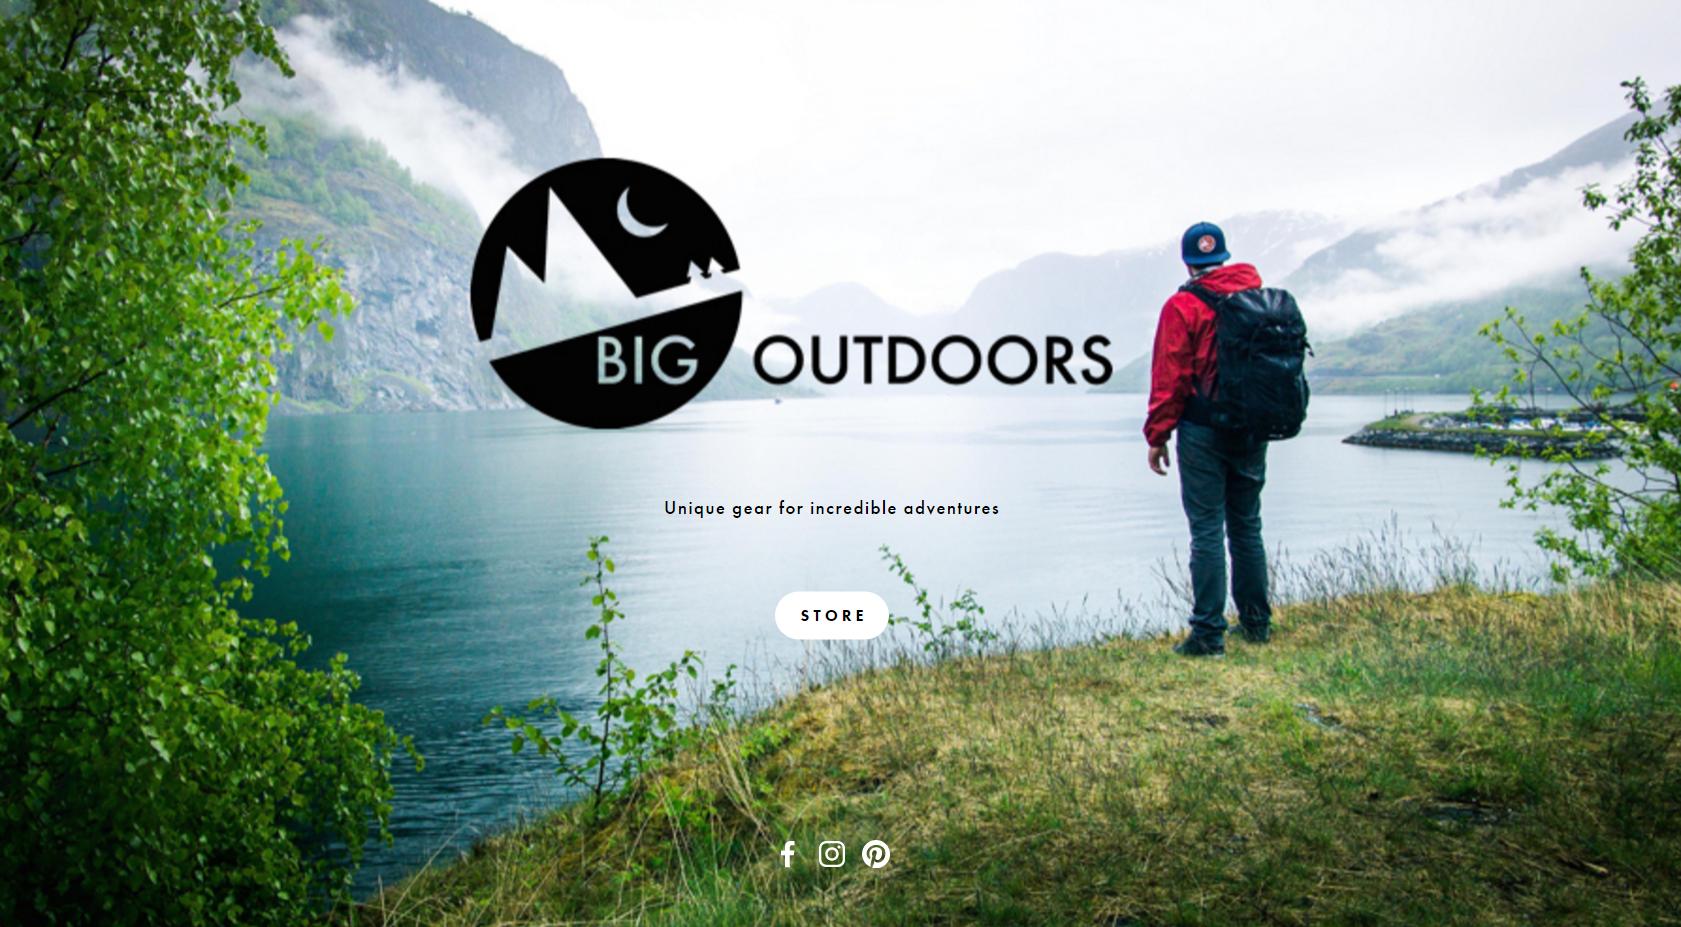 Big Outdoors